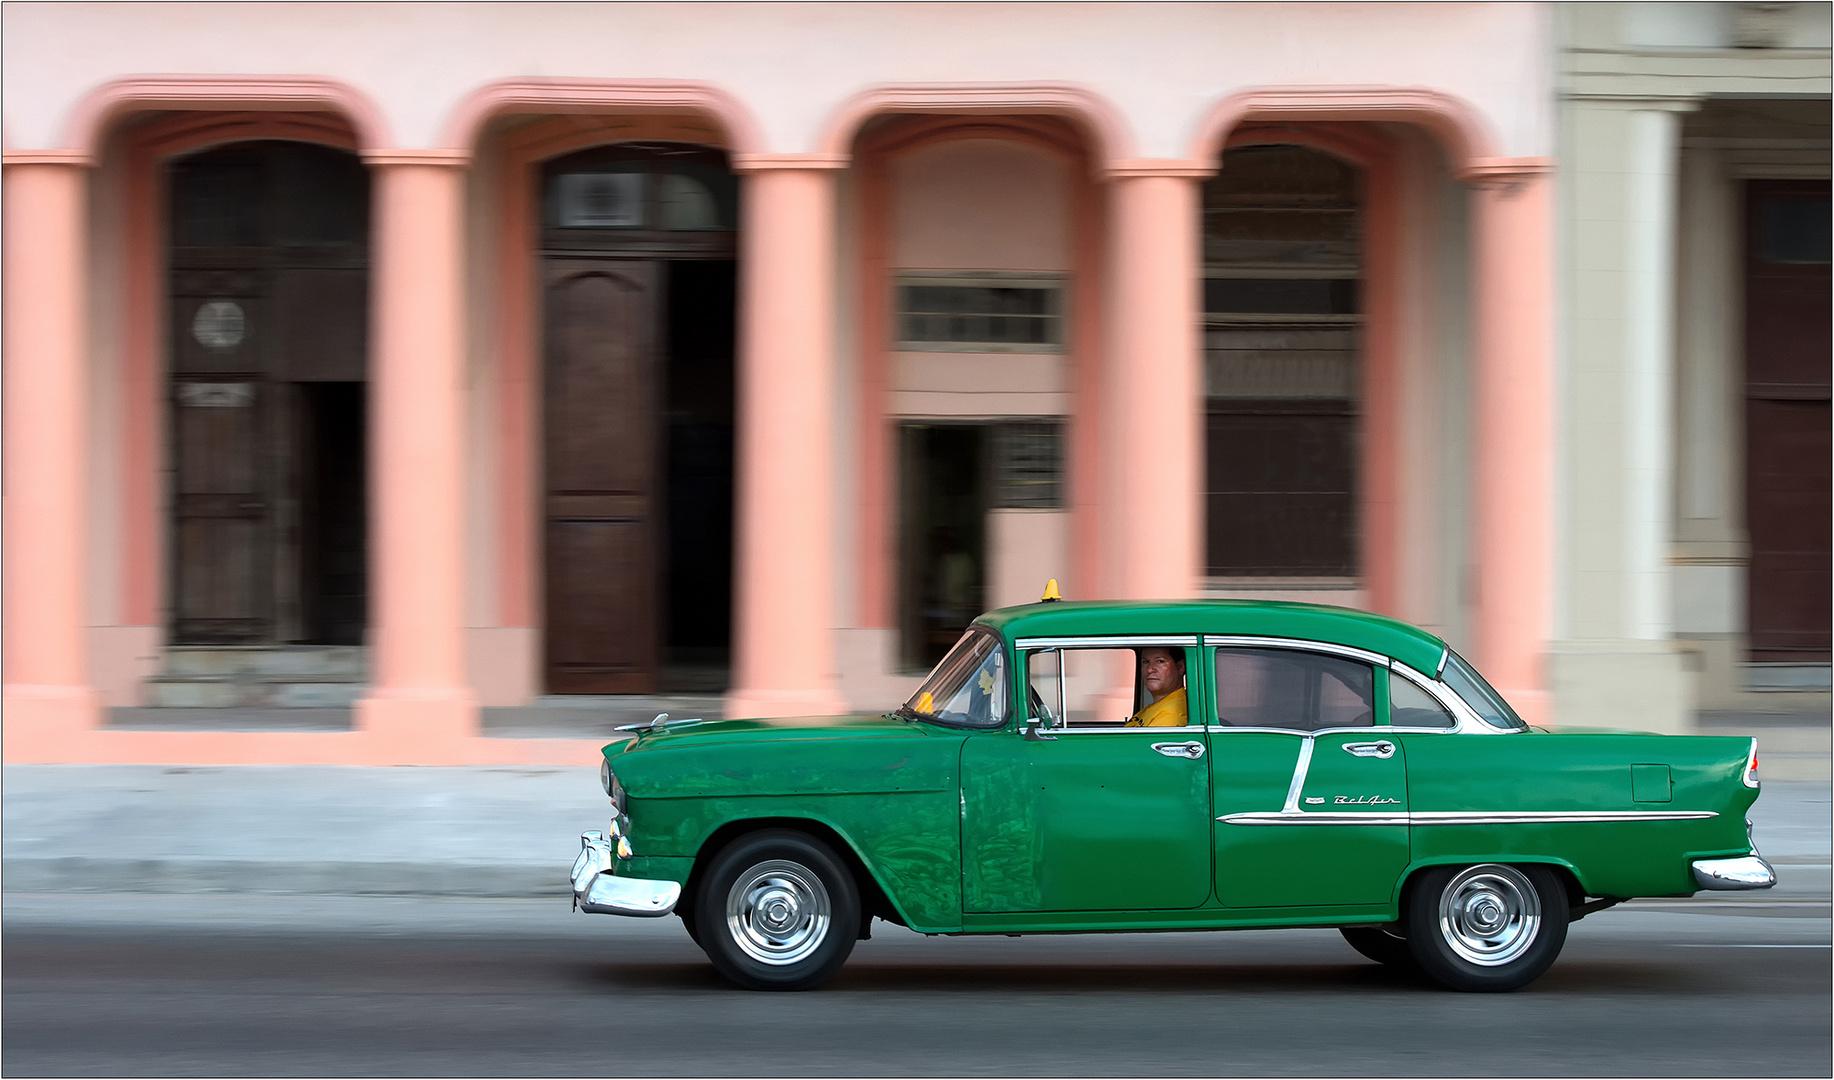 Green Cab - Havanna